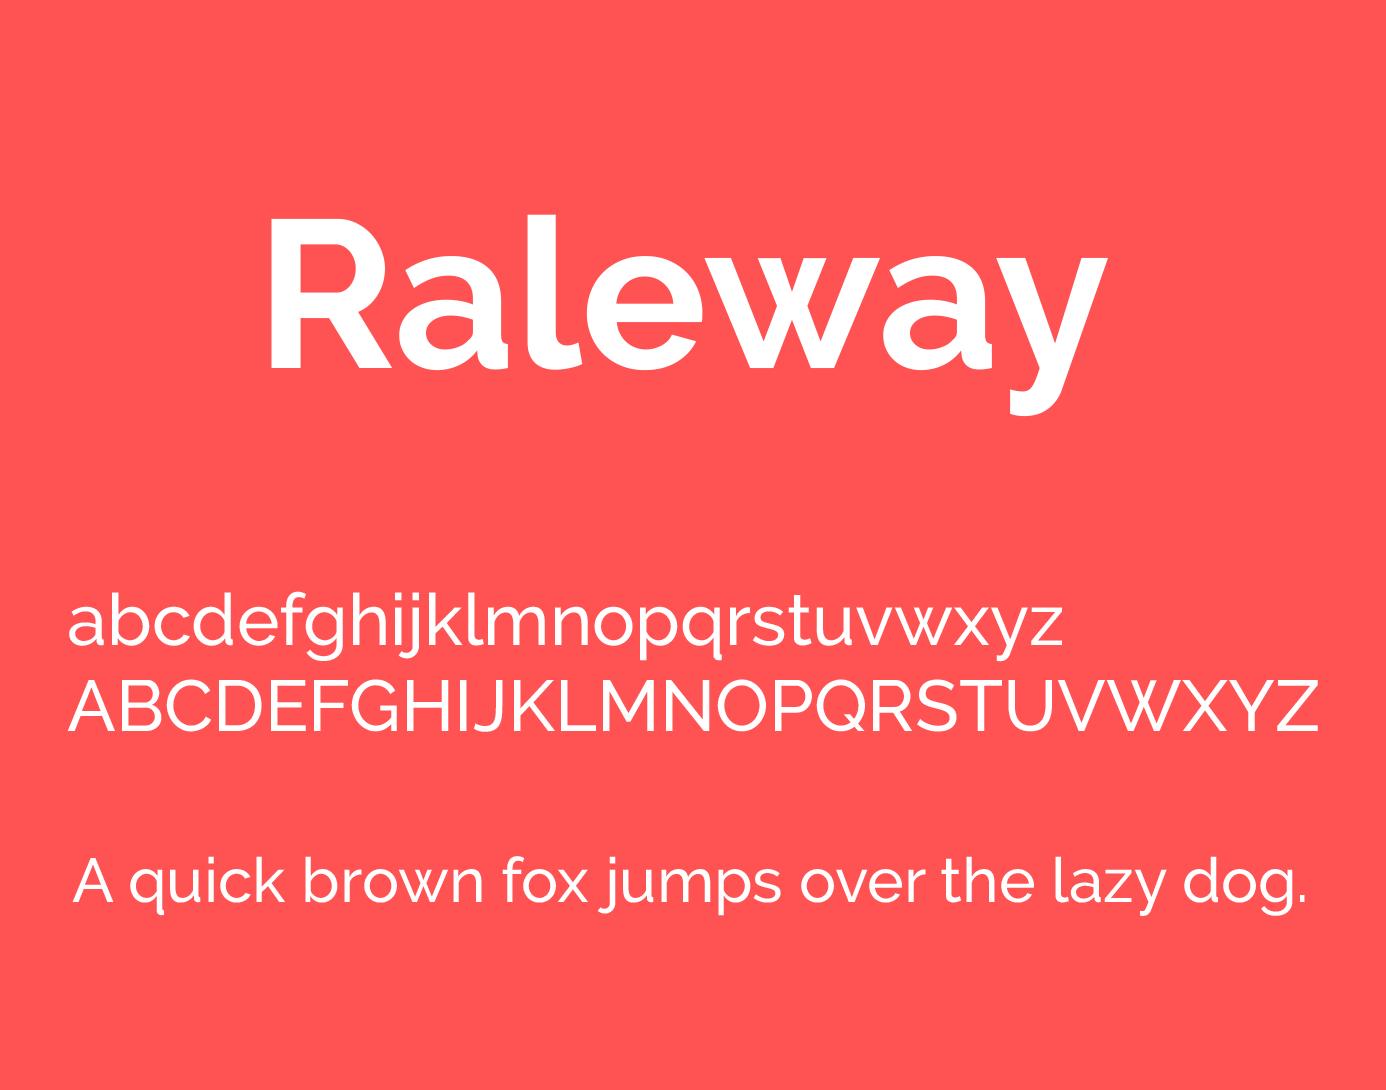 https://fontclarity.com/wp-content/uploads/2019/09/raleway-font-download-0.png Free Download